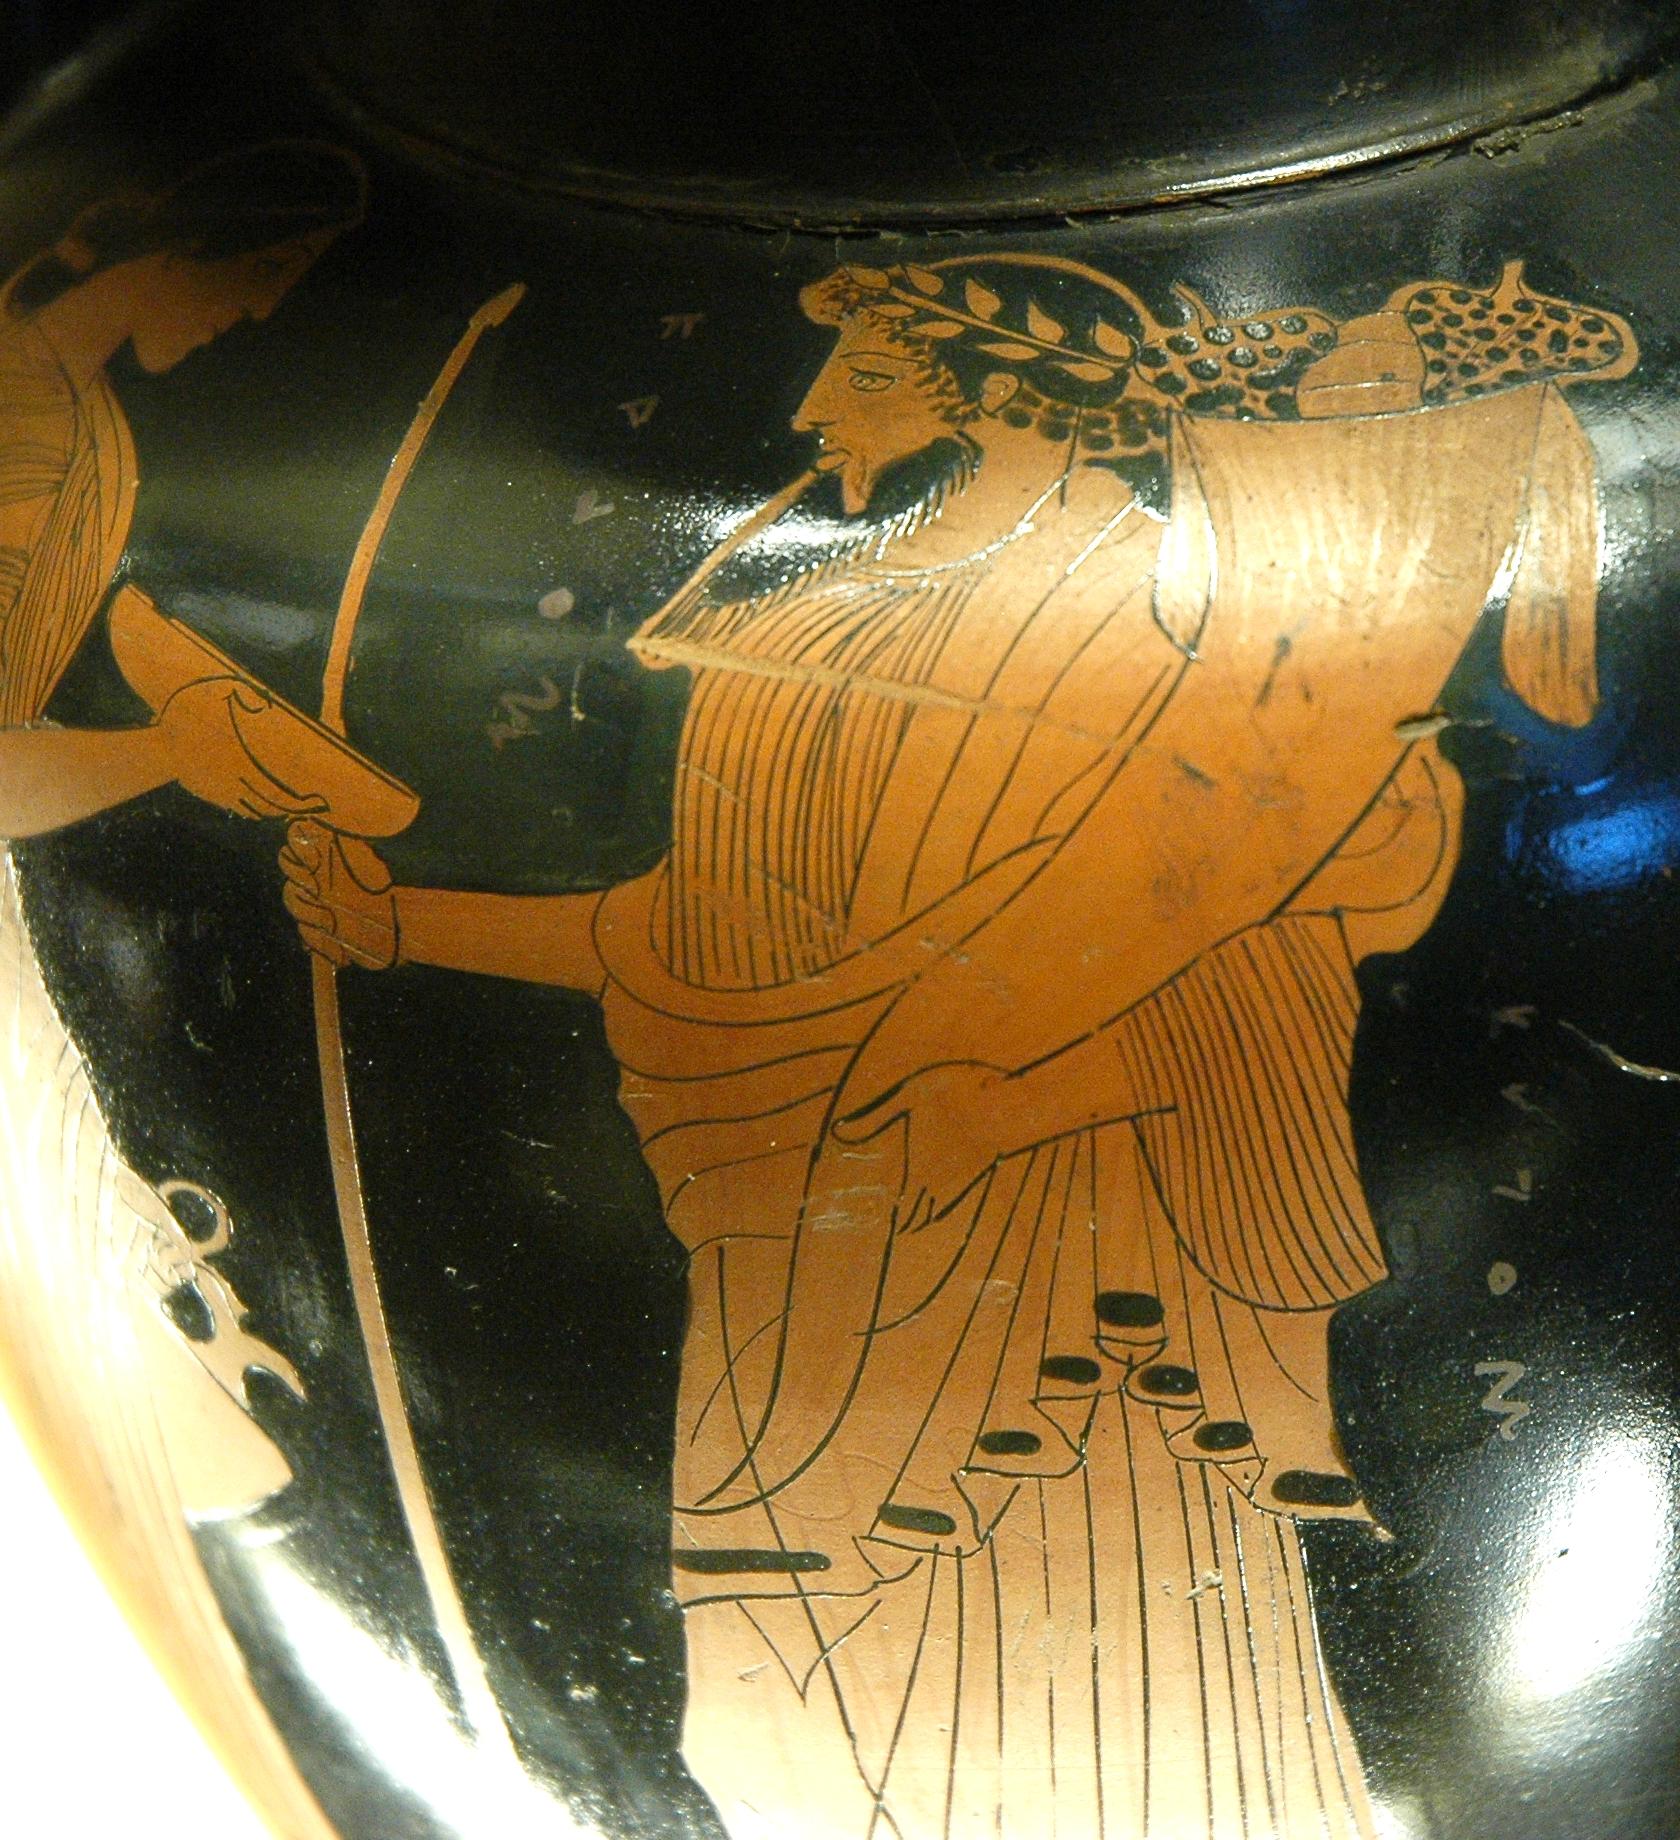 File:Amphora Hades Louvre G209.jpg - Wikimedia Commons